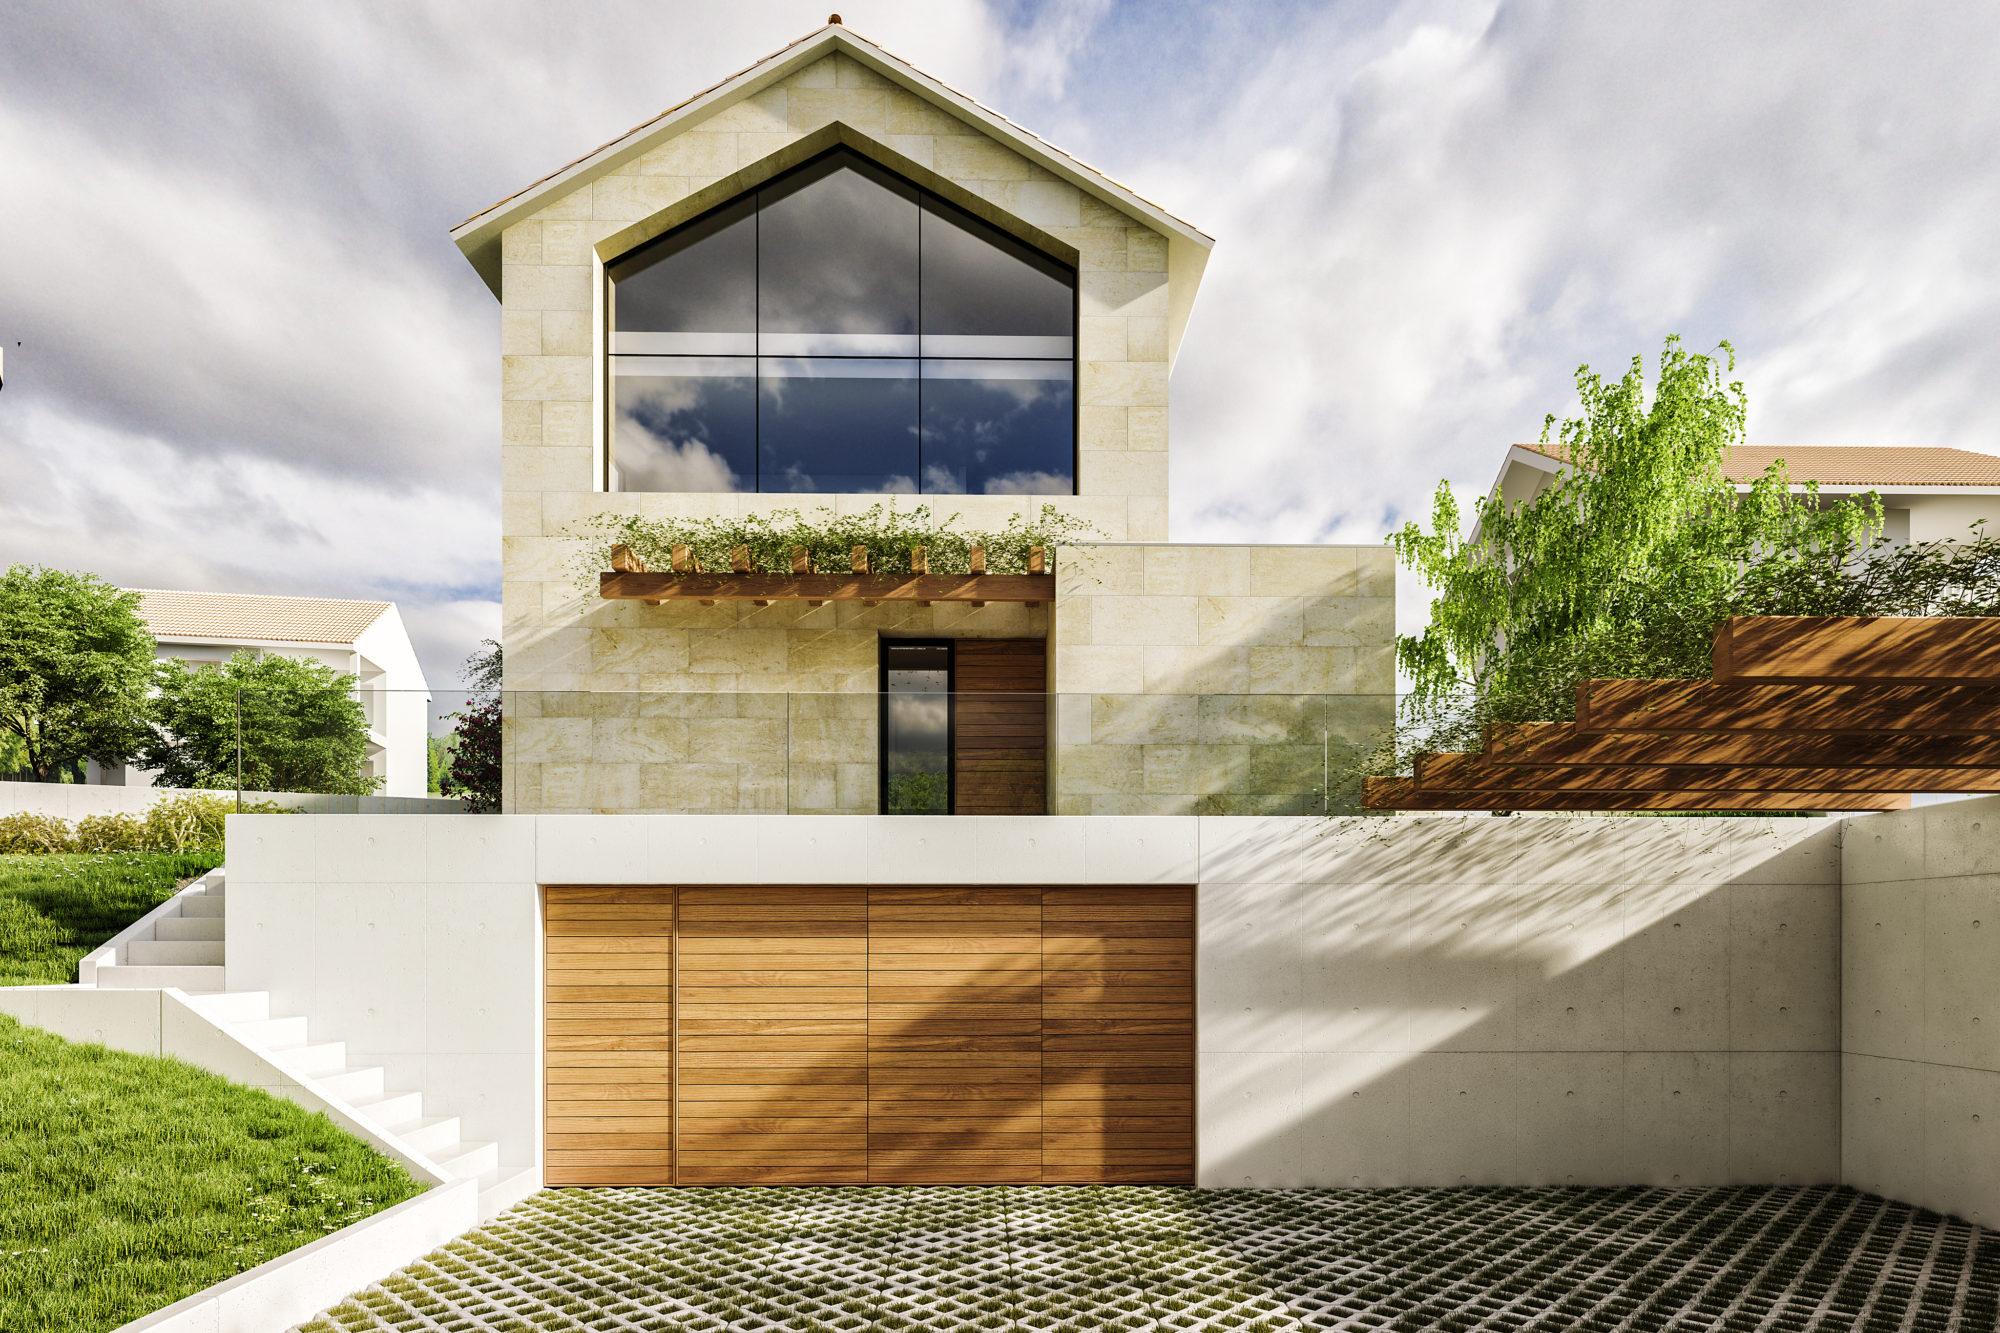 Arela-Arquitectura-Vivenda-Cabral